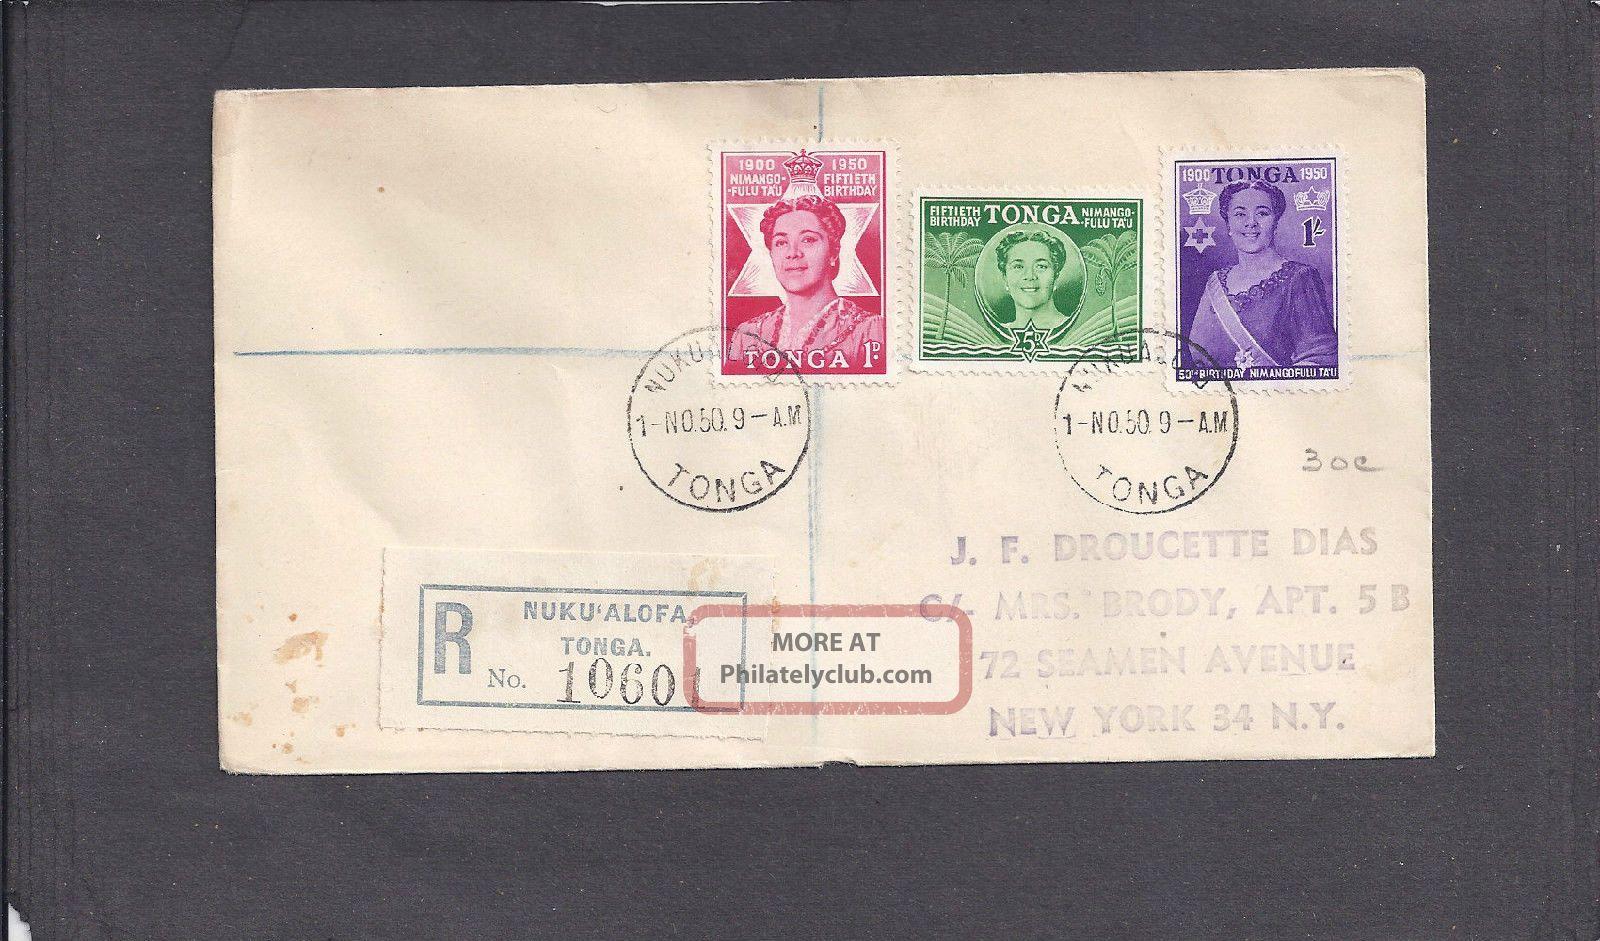 1950 Registered Birthday Issue Nukualofa,  Tonga Nov 1 - 1950 British Colonies & Territories photo